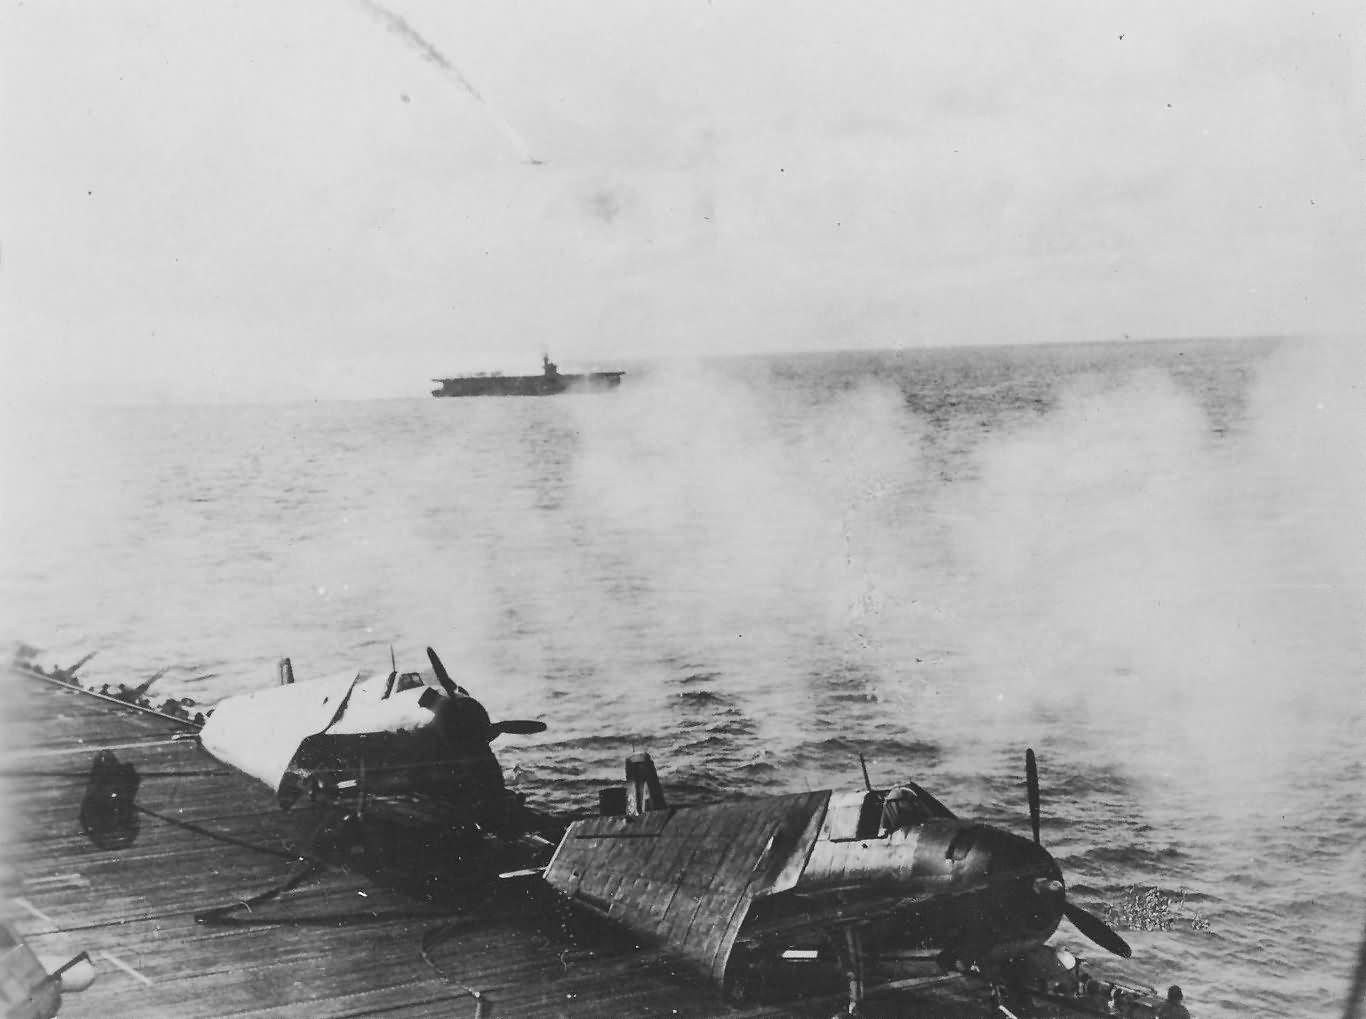 Japanese Kamikaze attempt on USS White Plains CVE-66